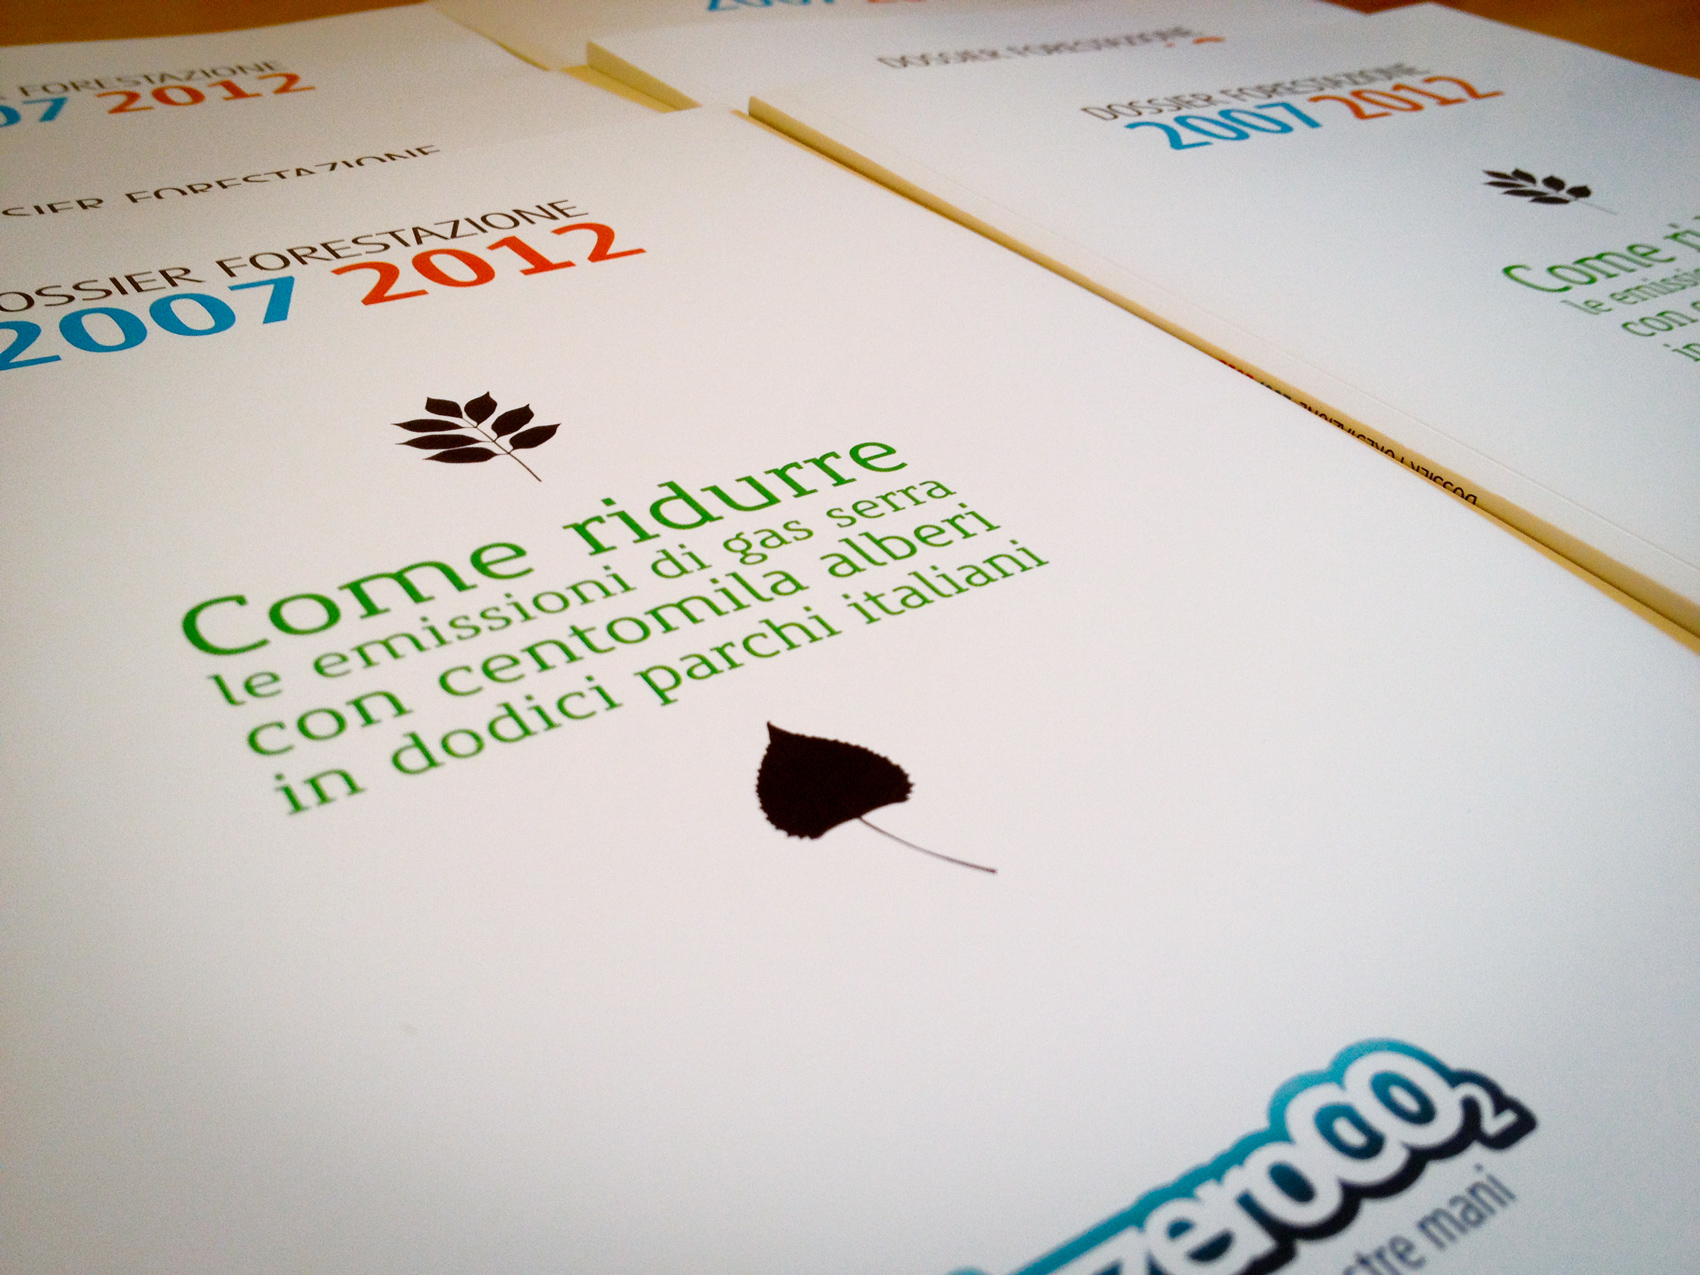 Dossier Forestazione 2007-2012